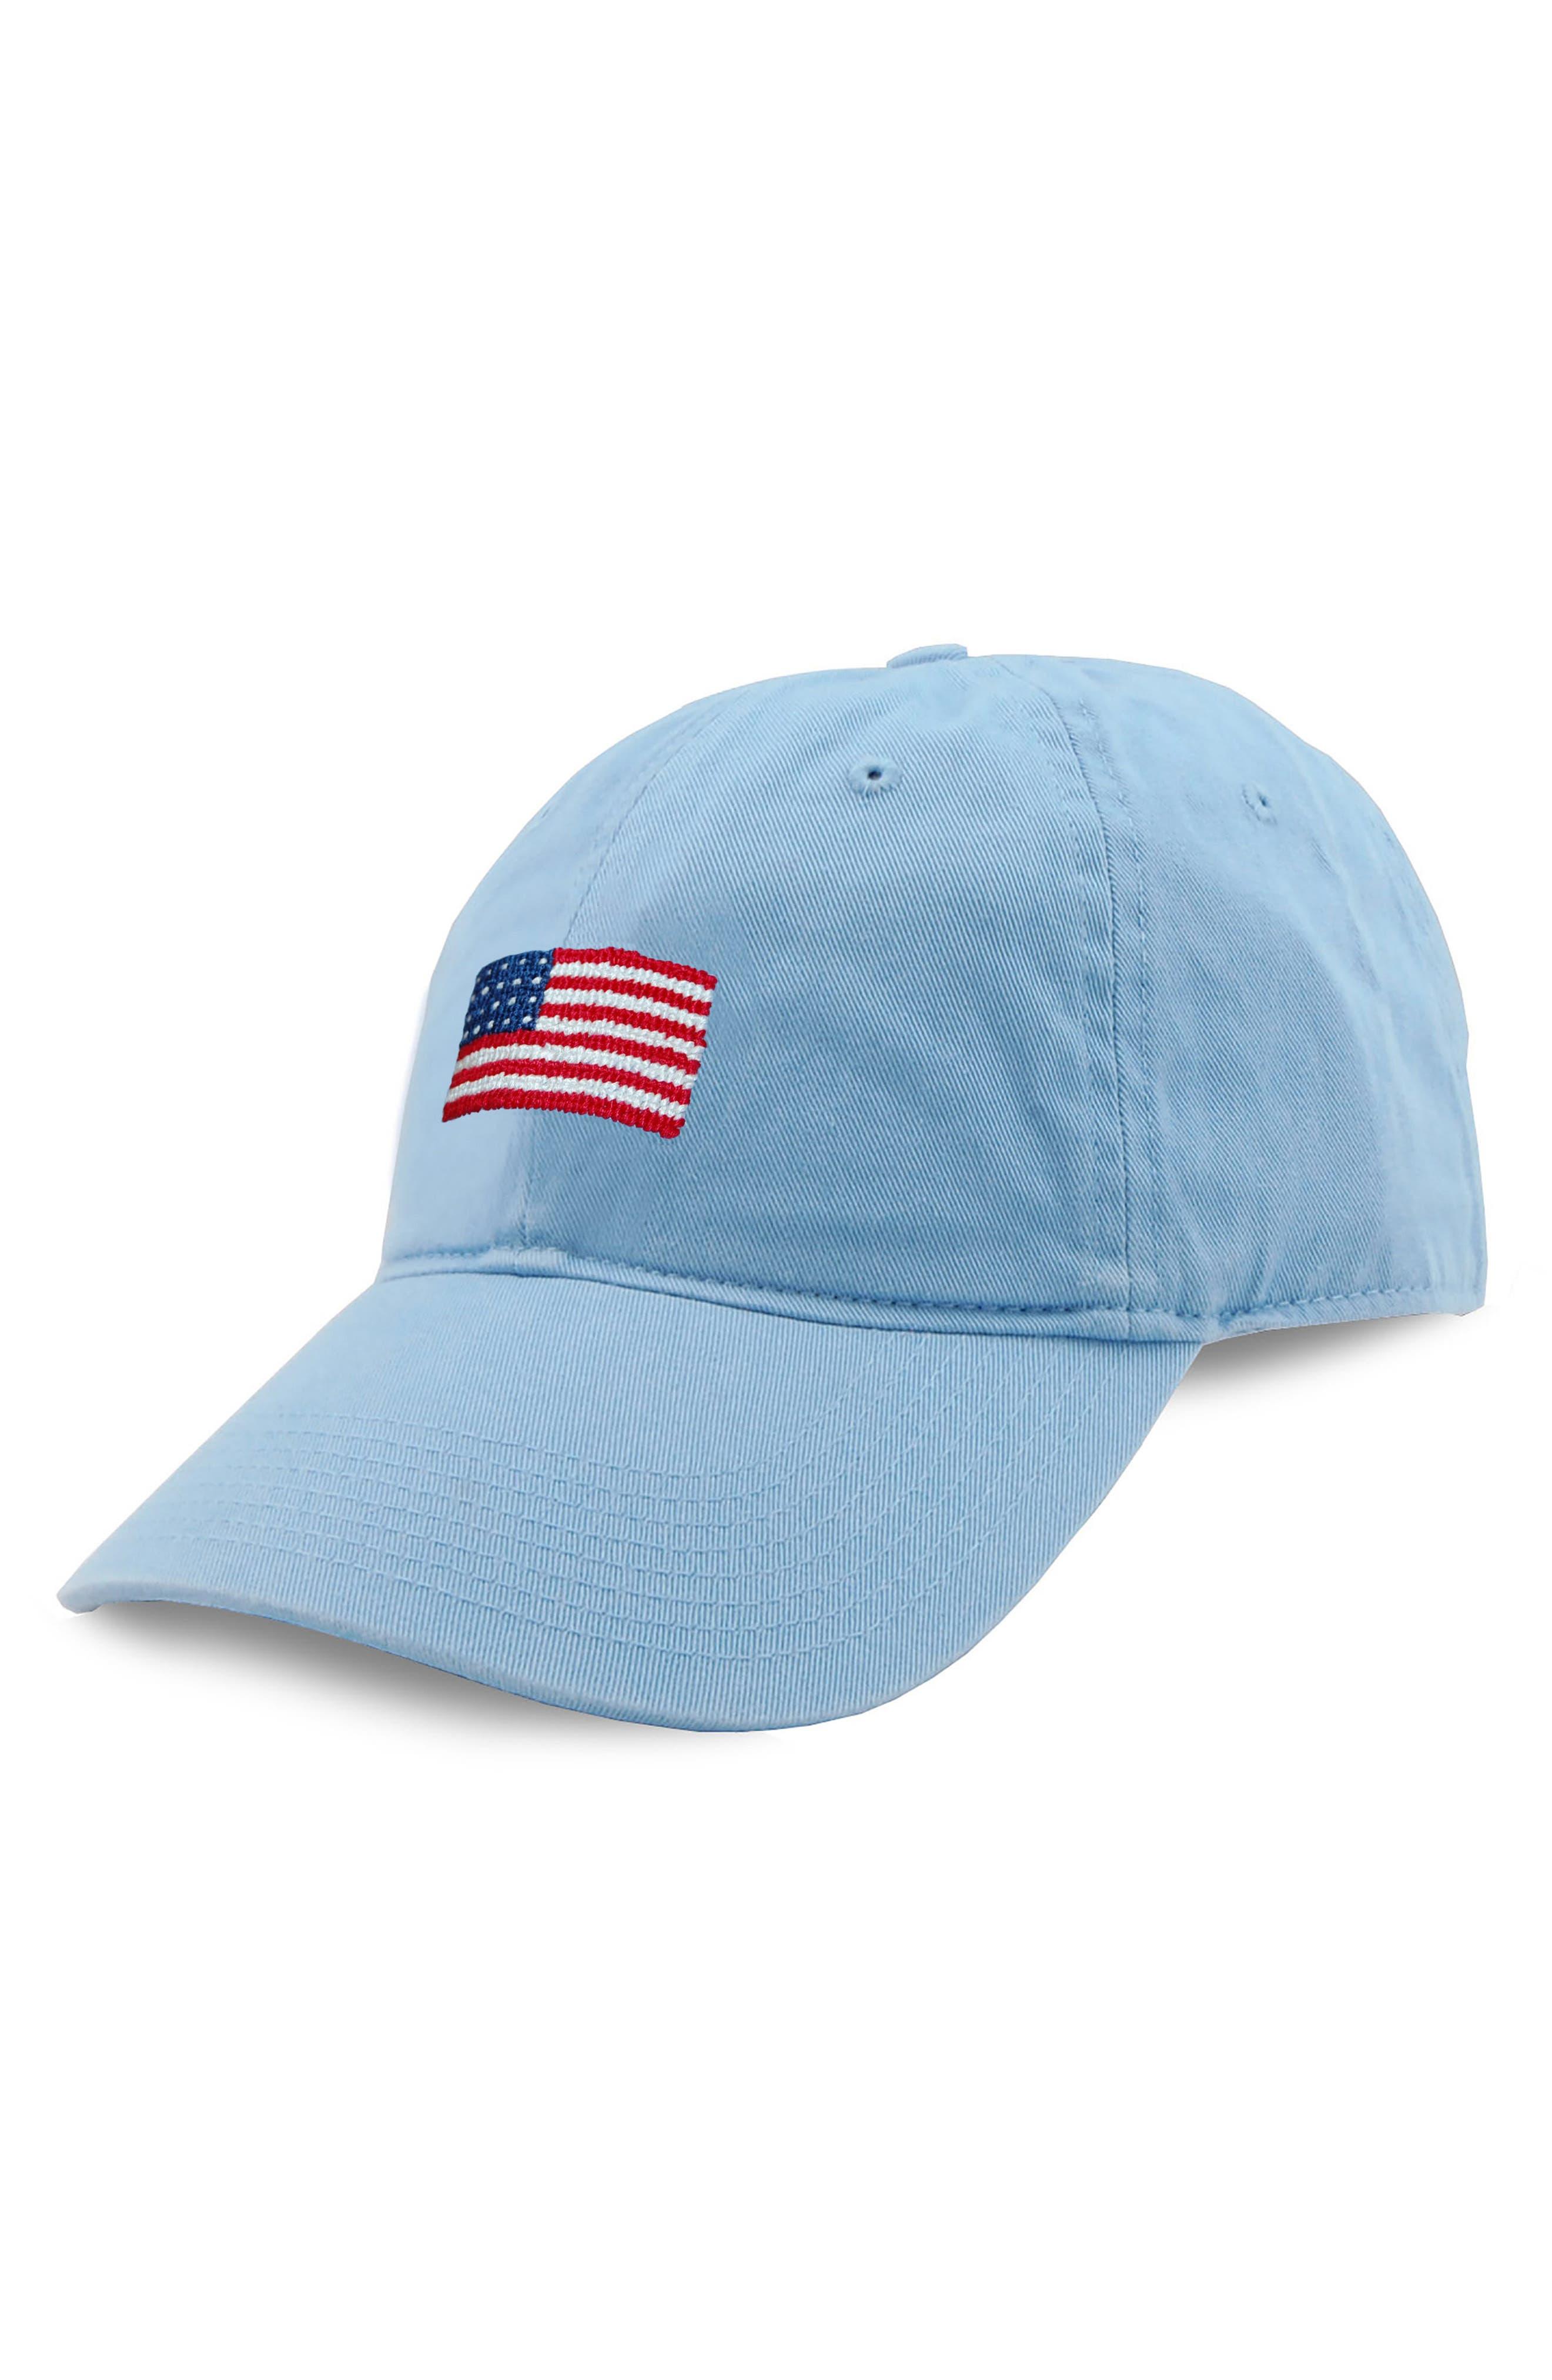 Main Image - Smathers & Branson 'American Flag' Baseball Cap